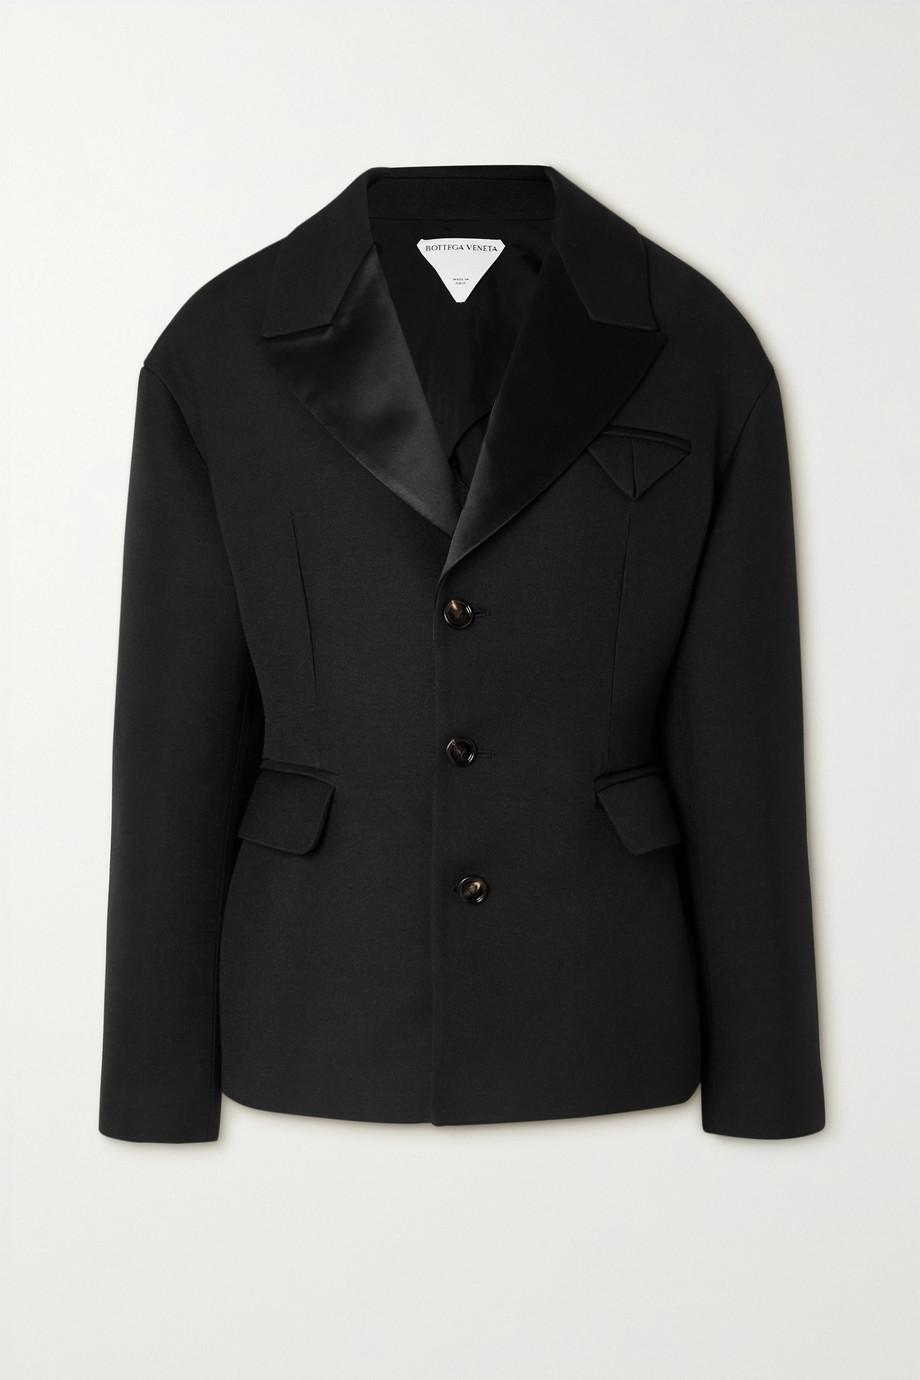 Bottega Veneta Satin-trimmed grain de poudre jacket